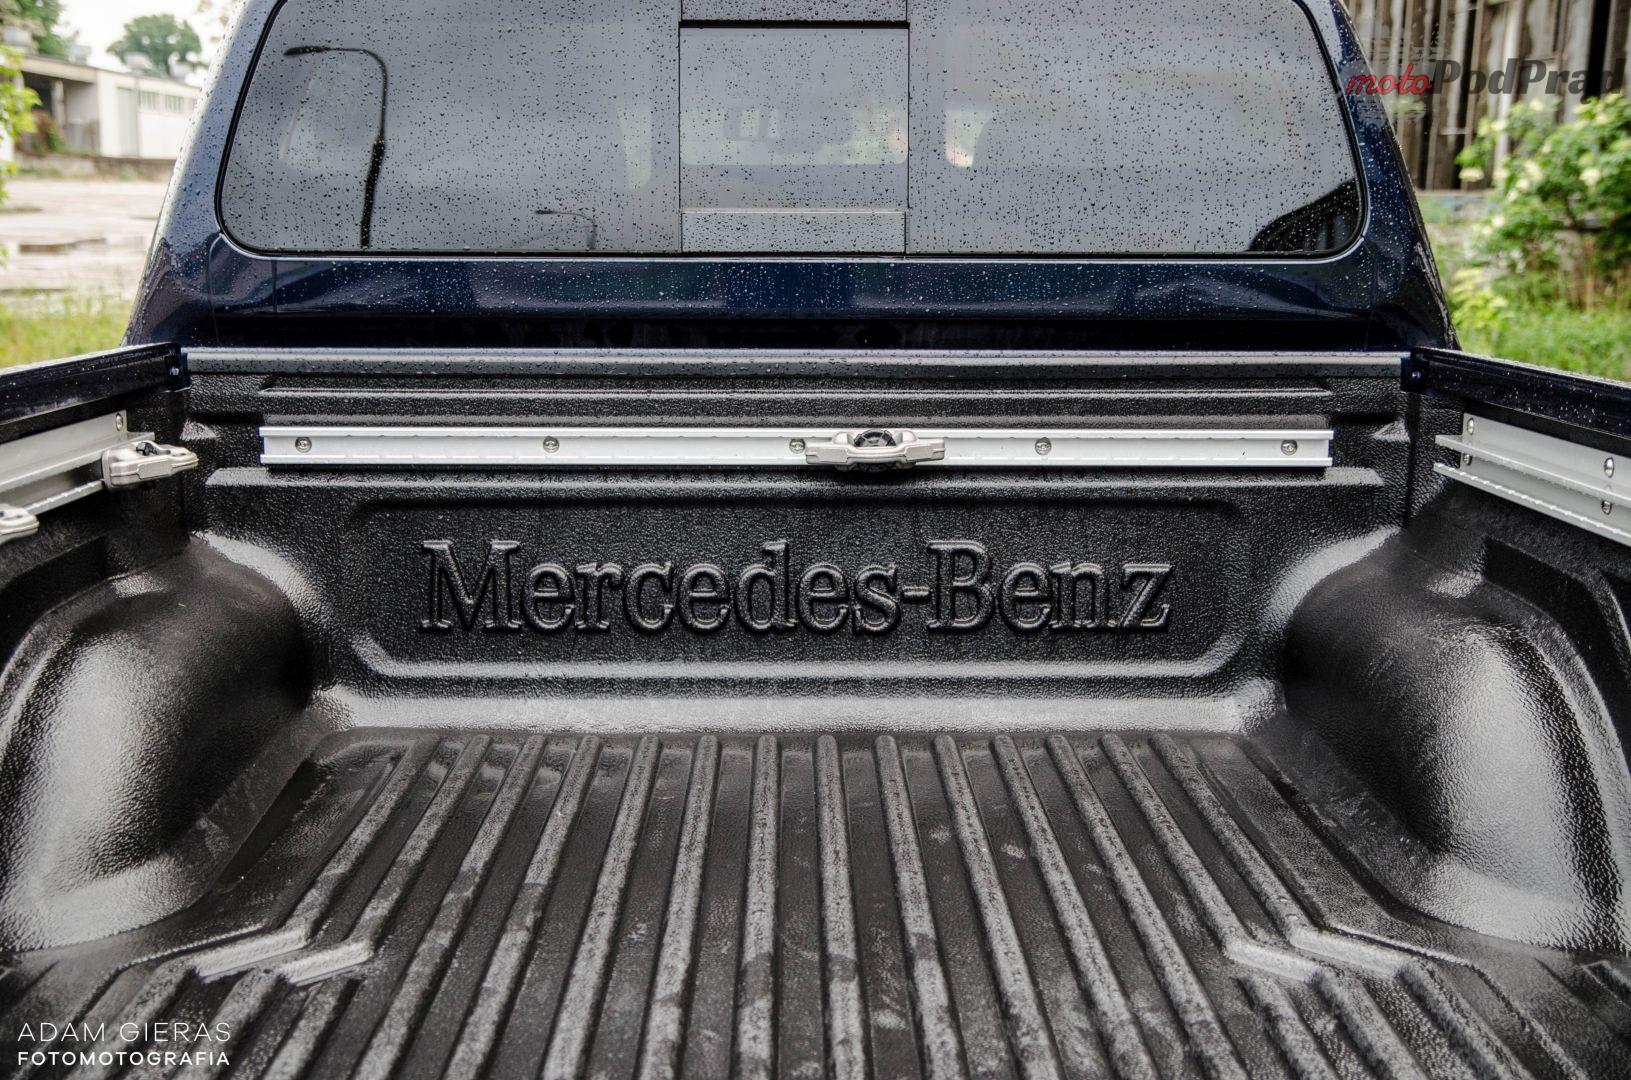 x klasa 18 Test: Mercedes X250d – zawartość cukru w cukrze